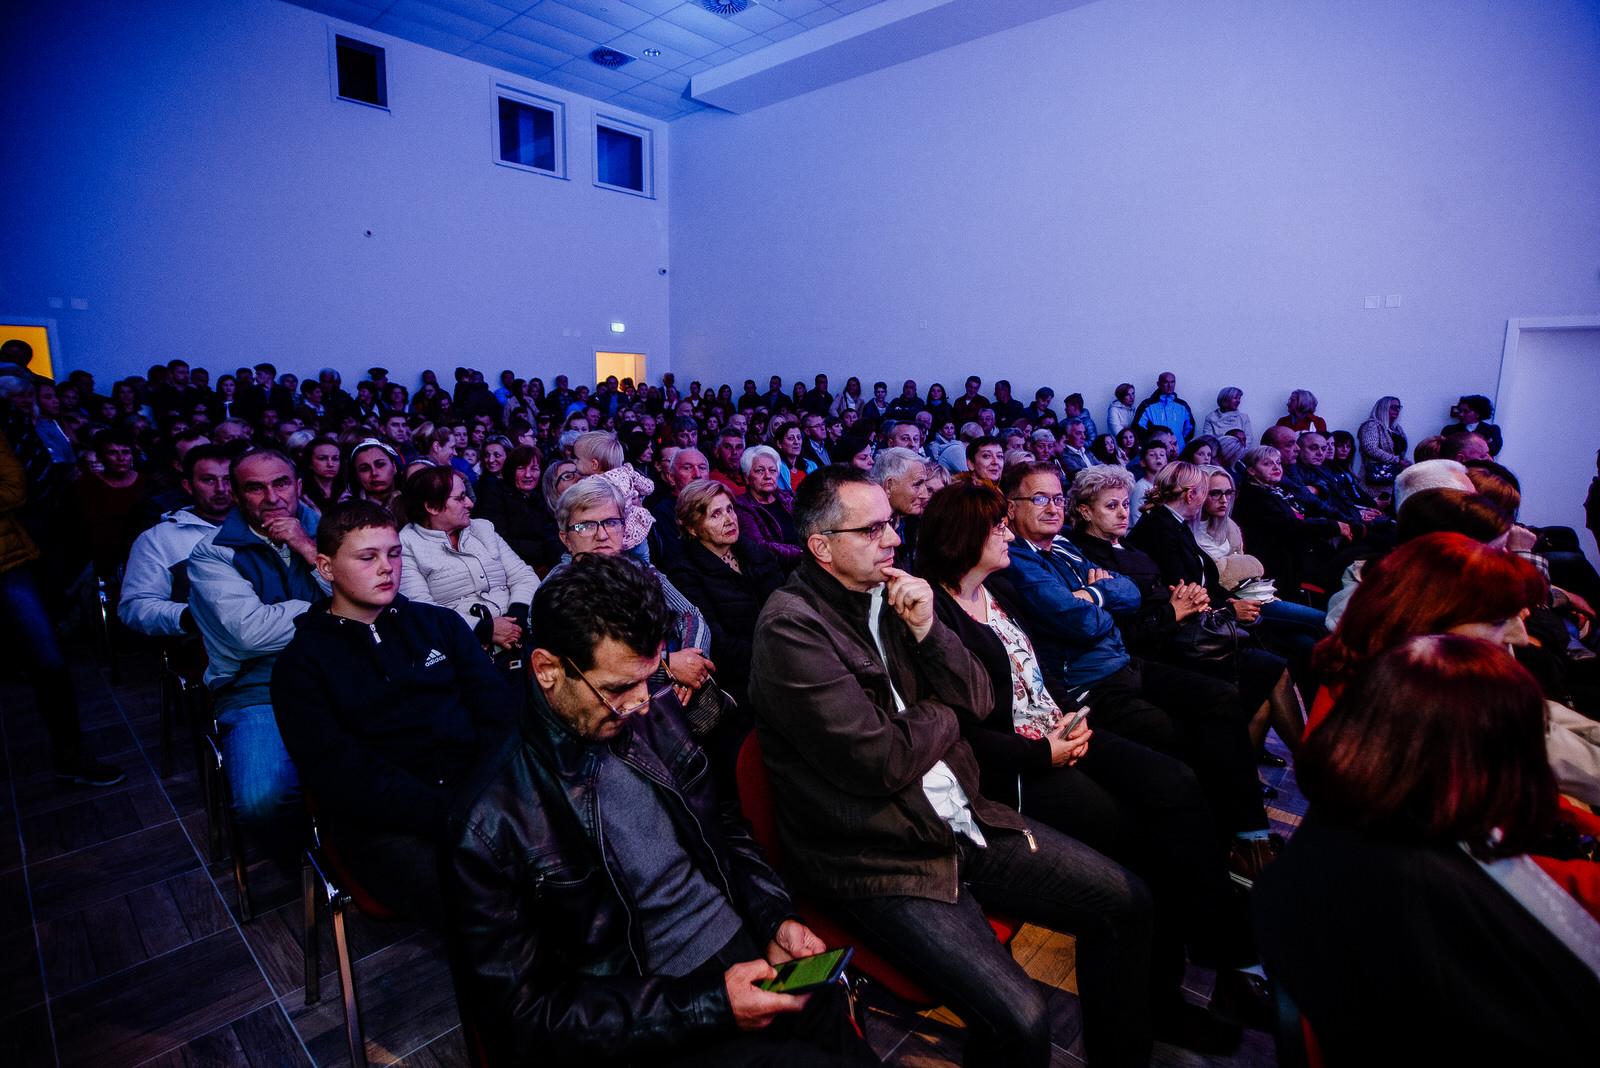 likaclub_korenica_klapa-intrade_dan-neovisnosti_2019-1